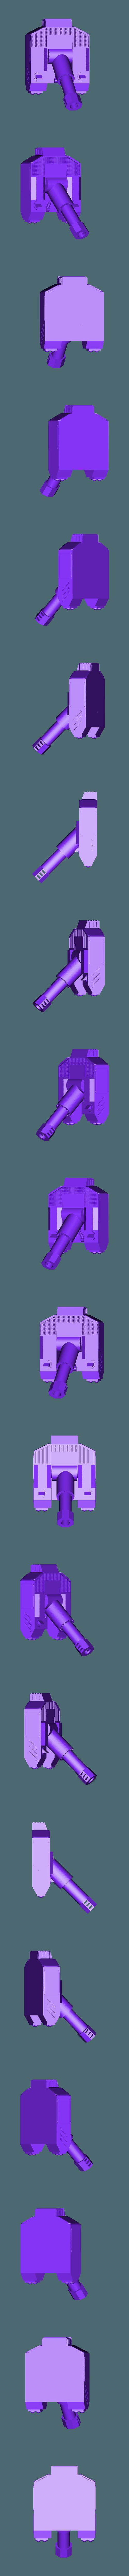 heavy_mortar_turret.stl Download free STL file Heavy Mortar turret for 28mm wargames. Warhammer, warpath ect • 3D print object, redstarkits